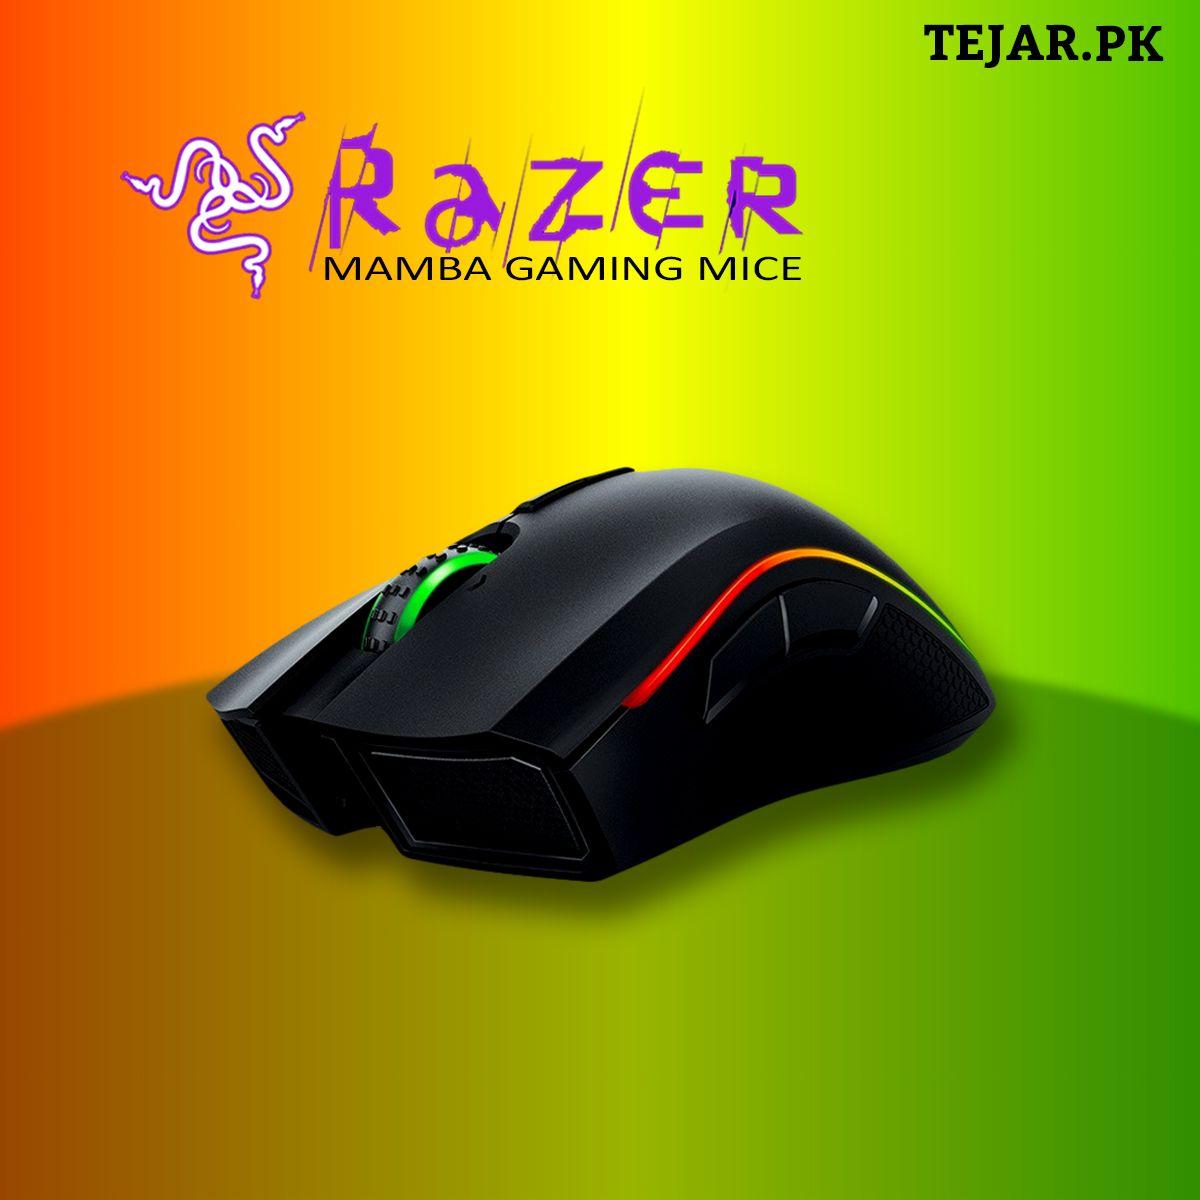 Razer Mamba Gaming Mice | Electronics & Computers | Games